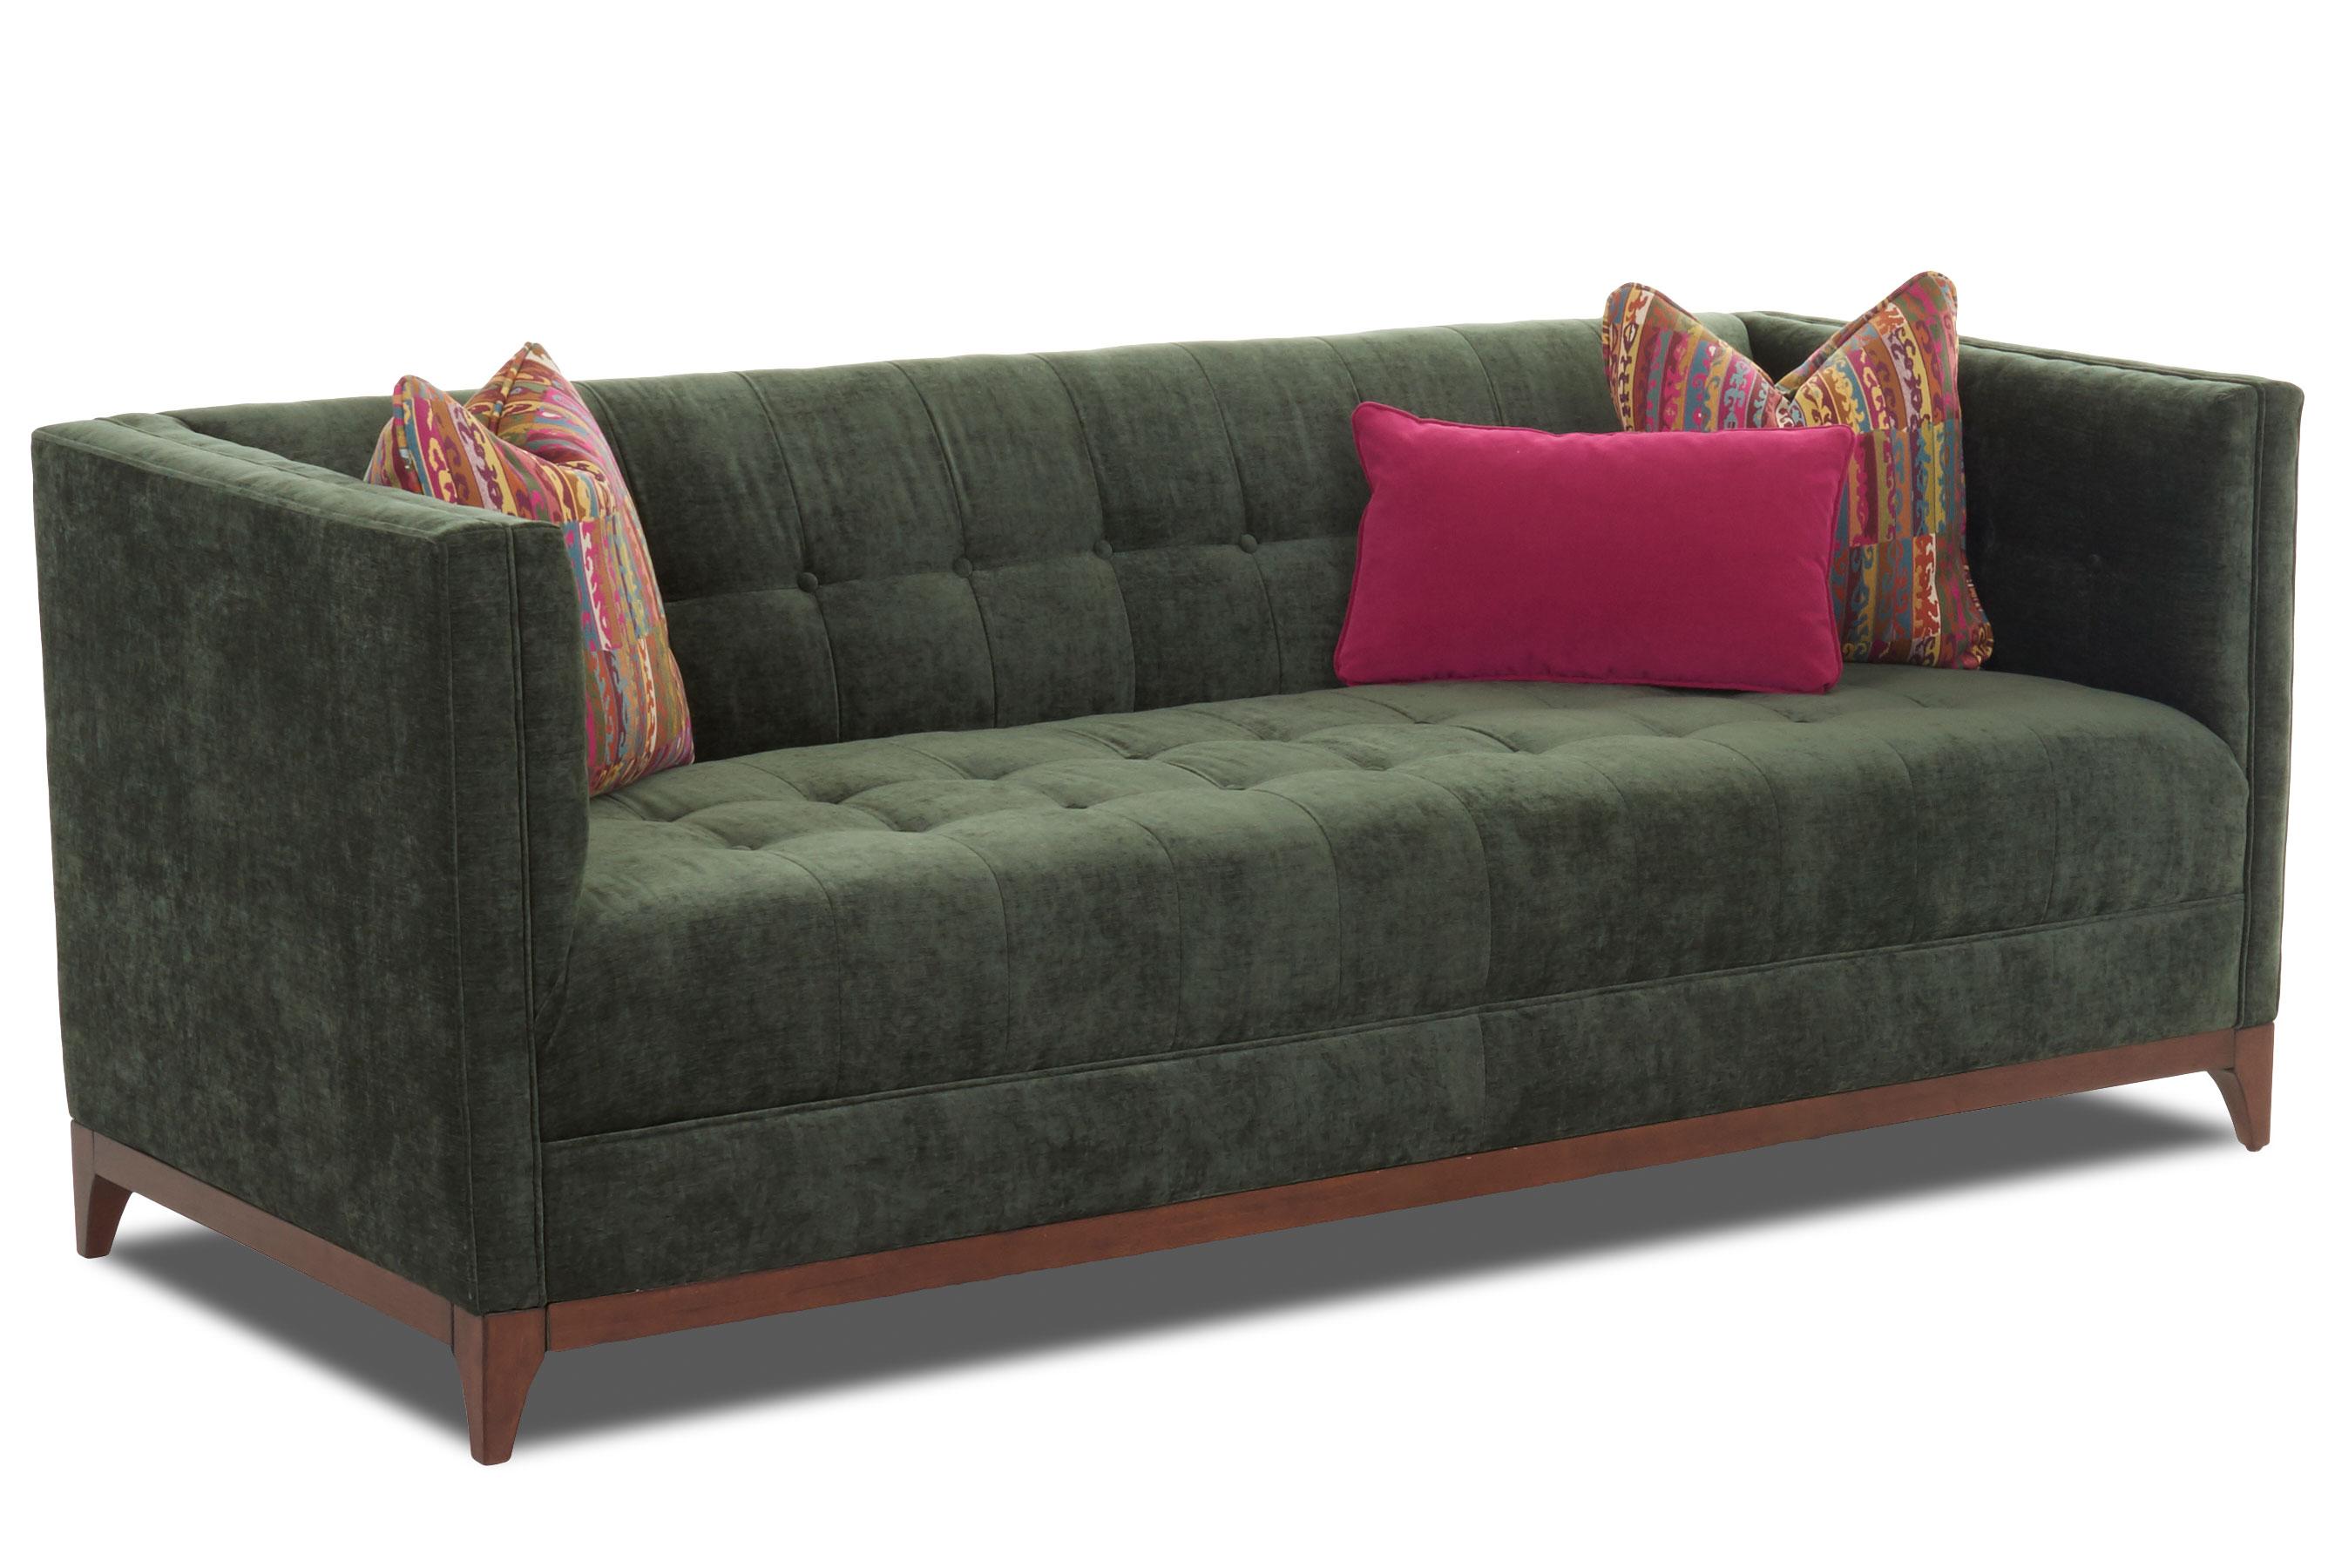 Peachy Boulevard 86 Sofa W Down Cushions Sofas And Sectionals Inzonedesignstudio Interior Chair Design Inzonedesignstudiocom